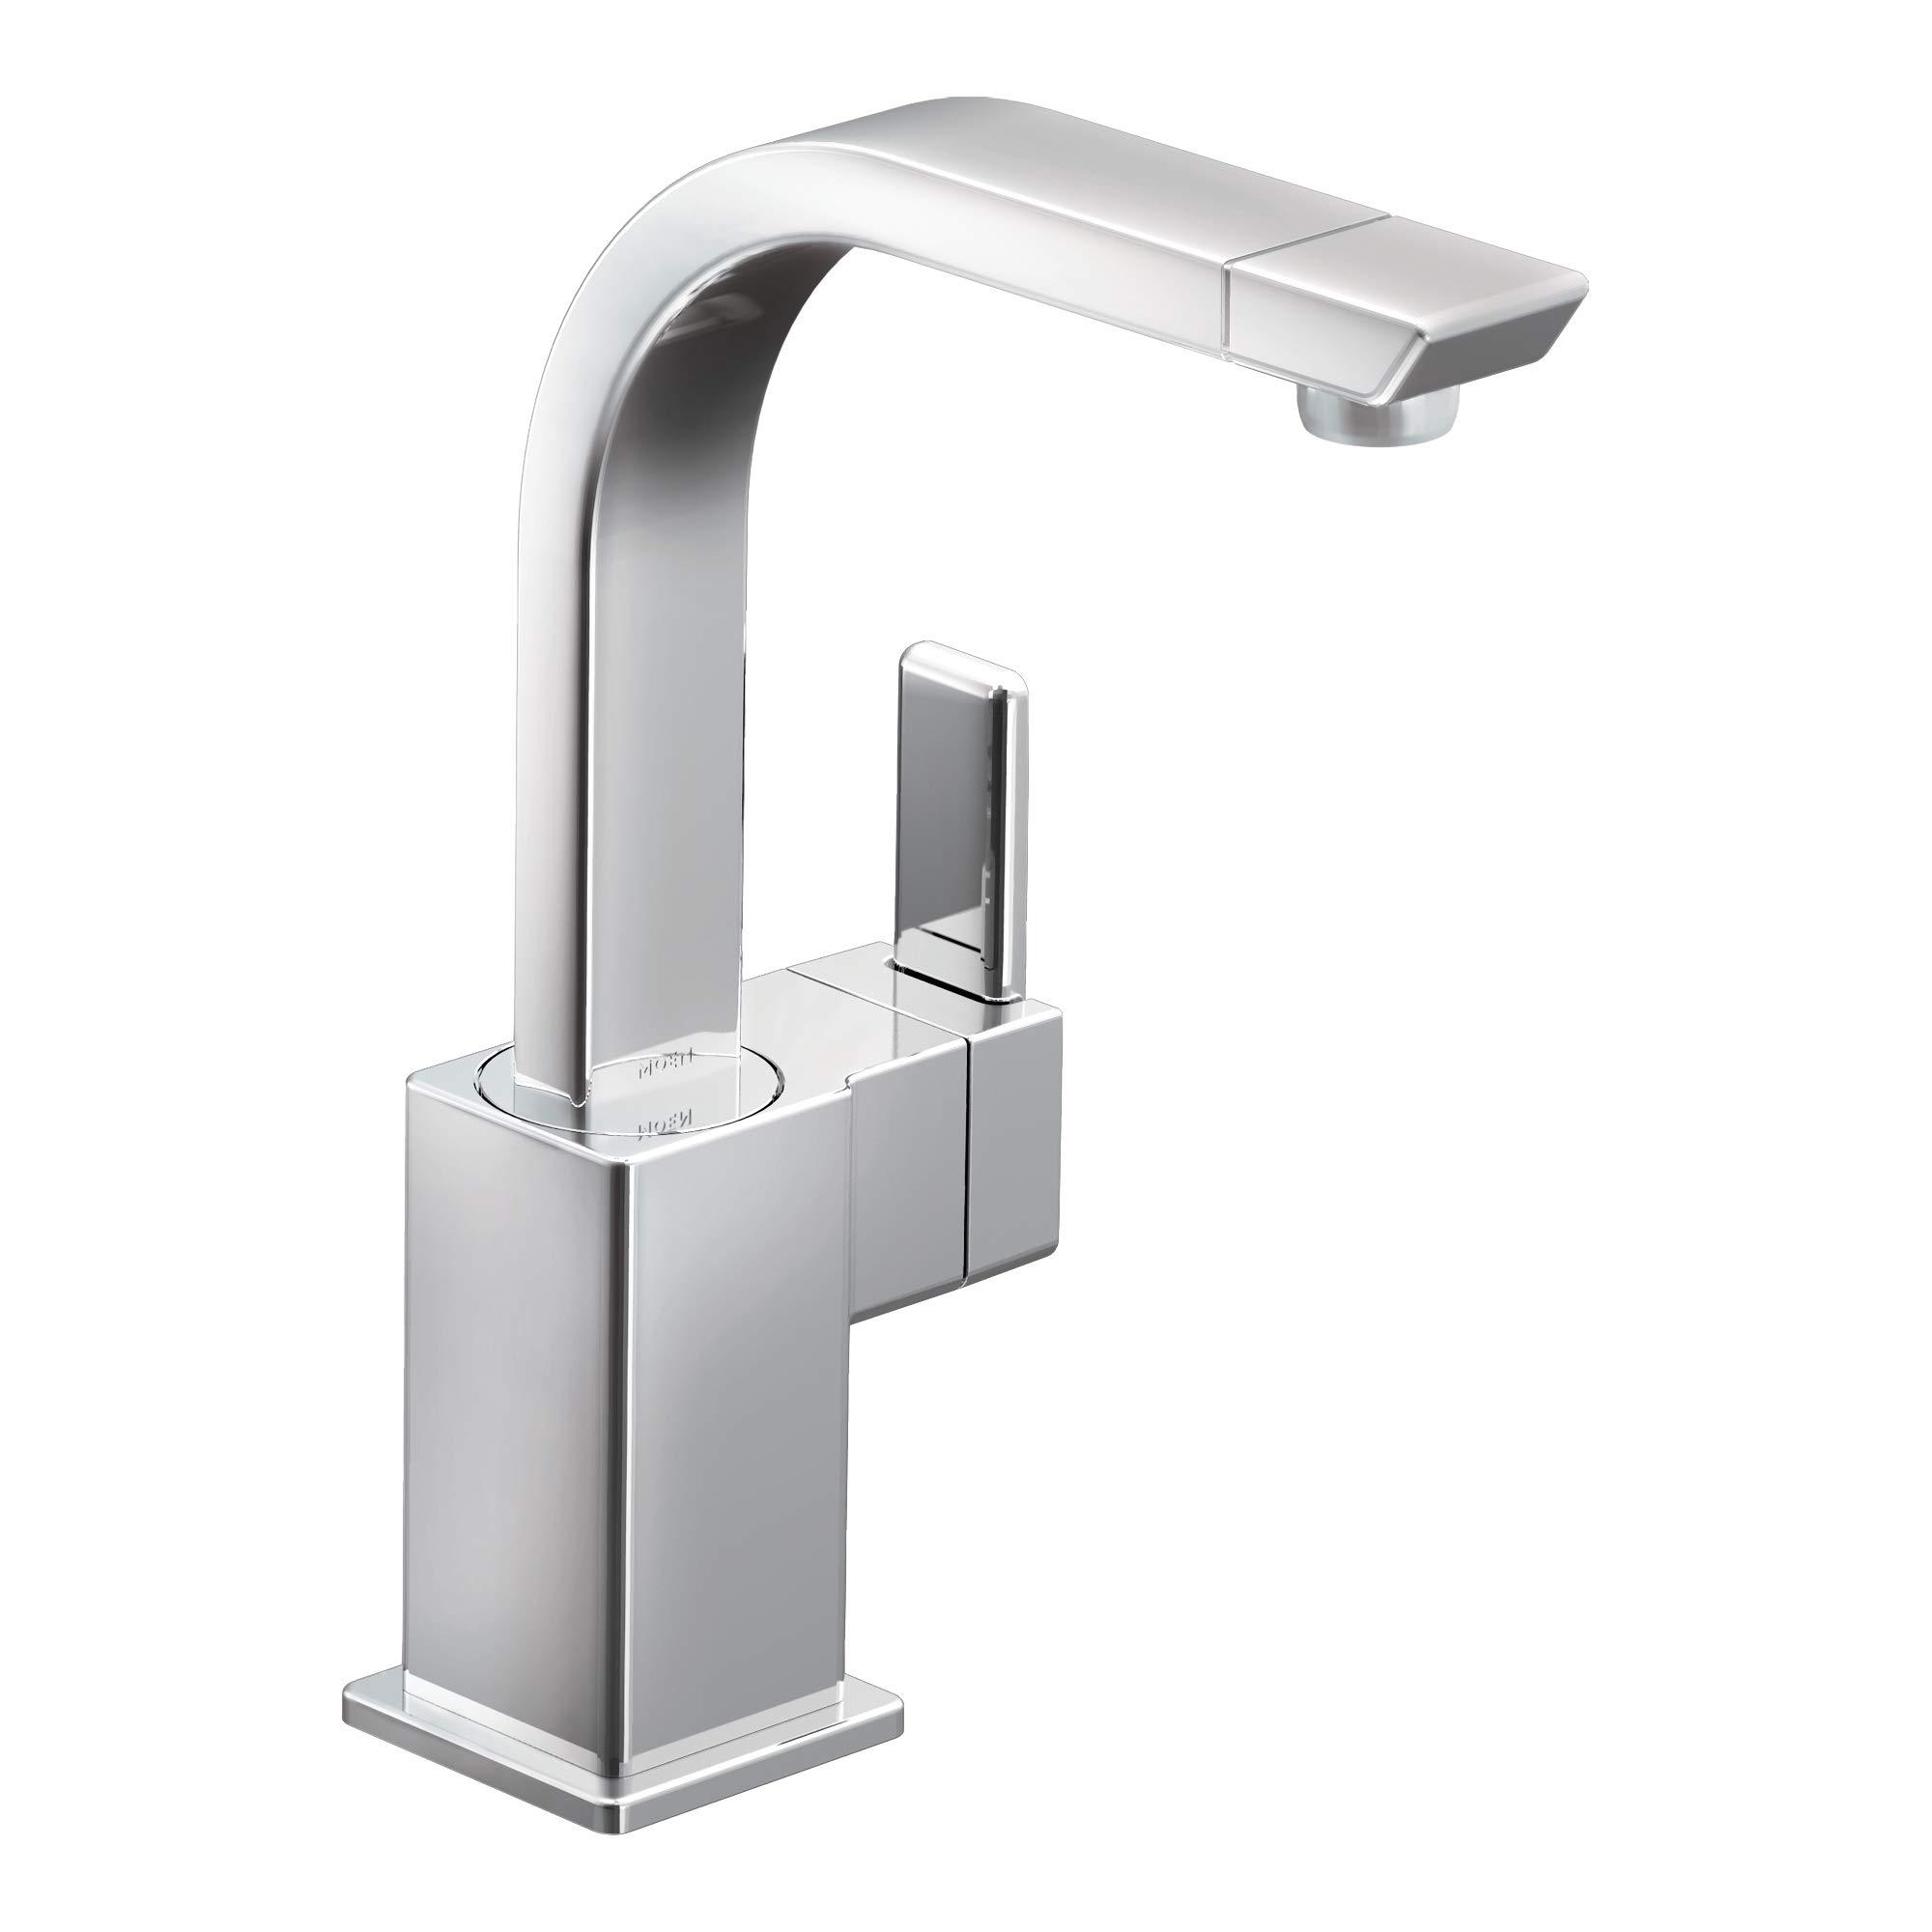 Moen S5170 90 Degree One-Handle High Arc Single Mount Bar Faucet, Chrome